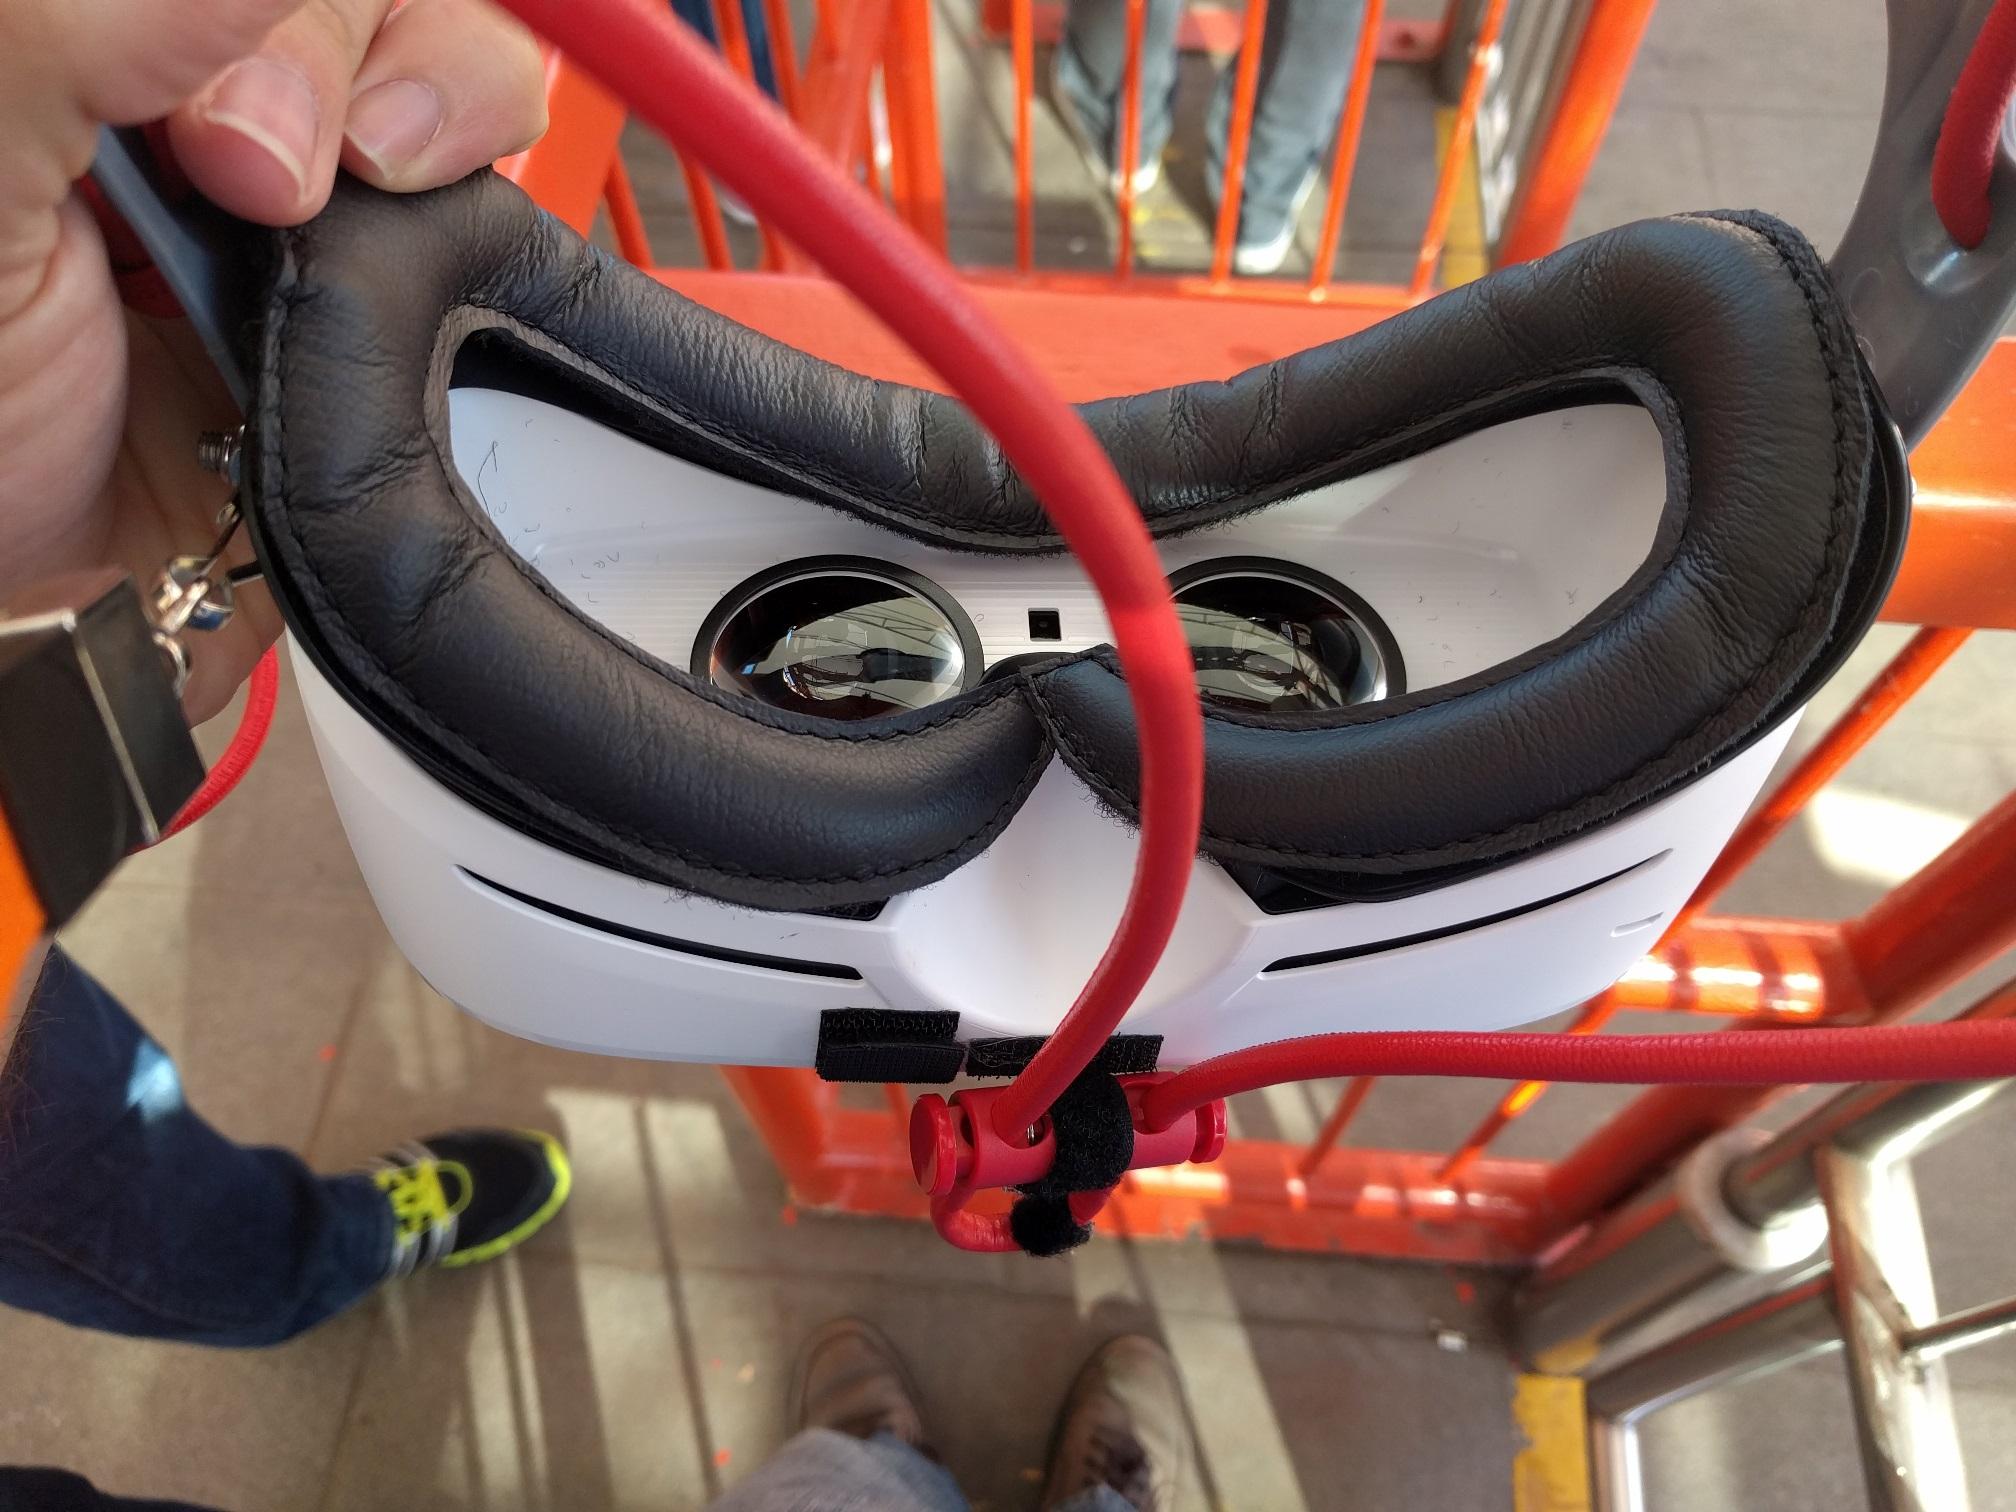 Kong VR Headset